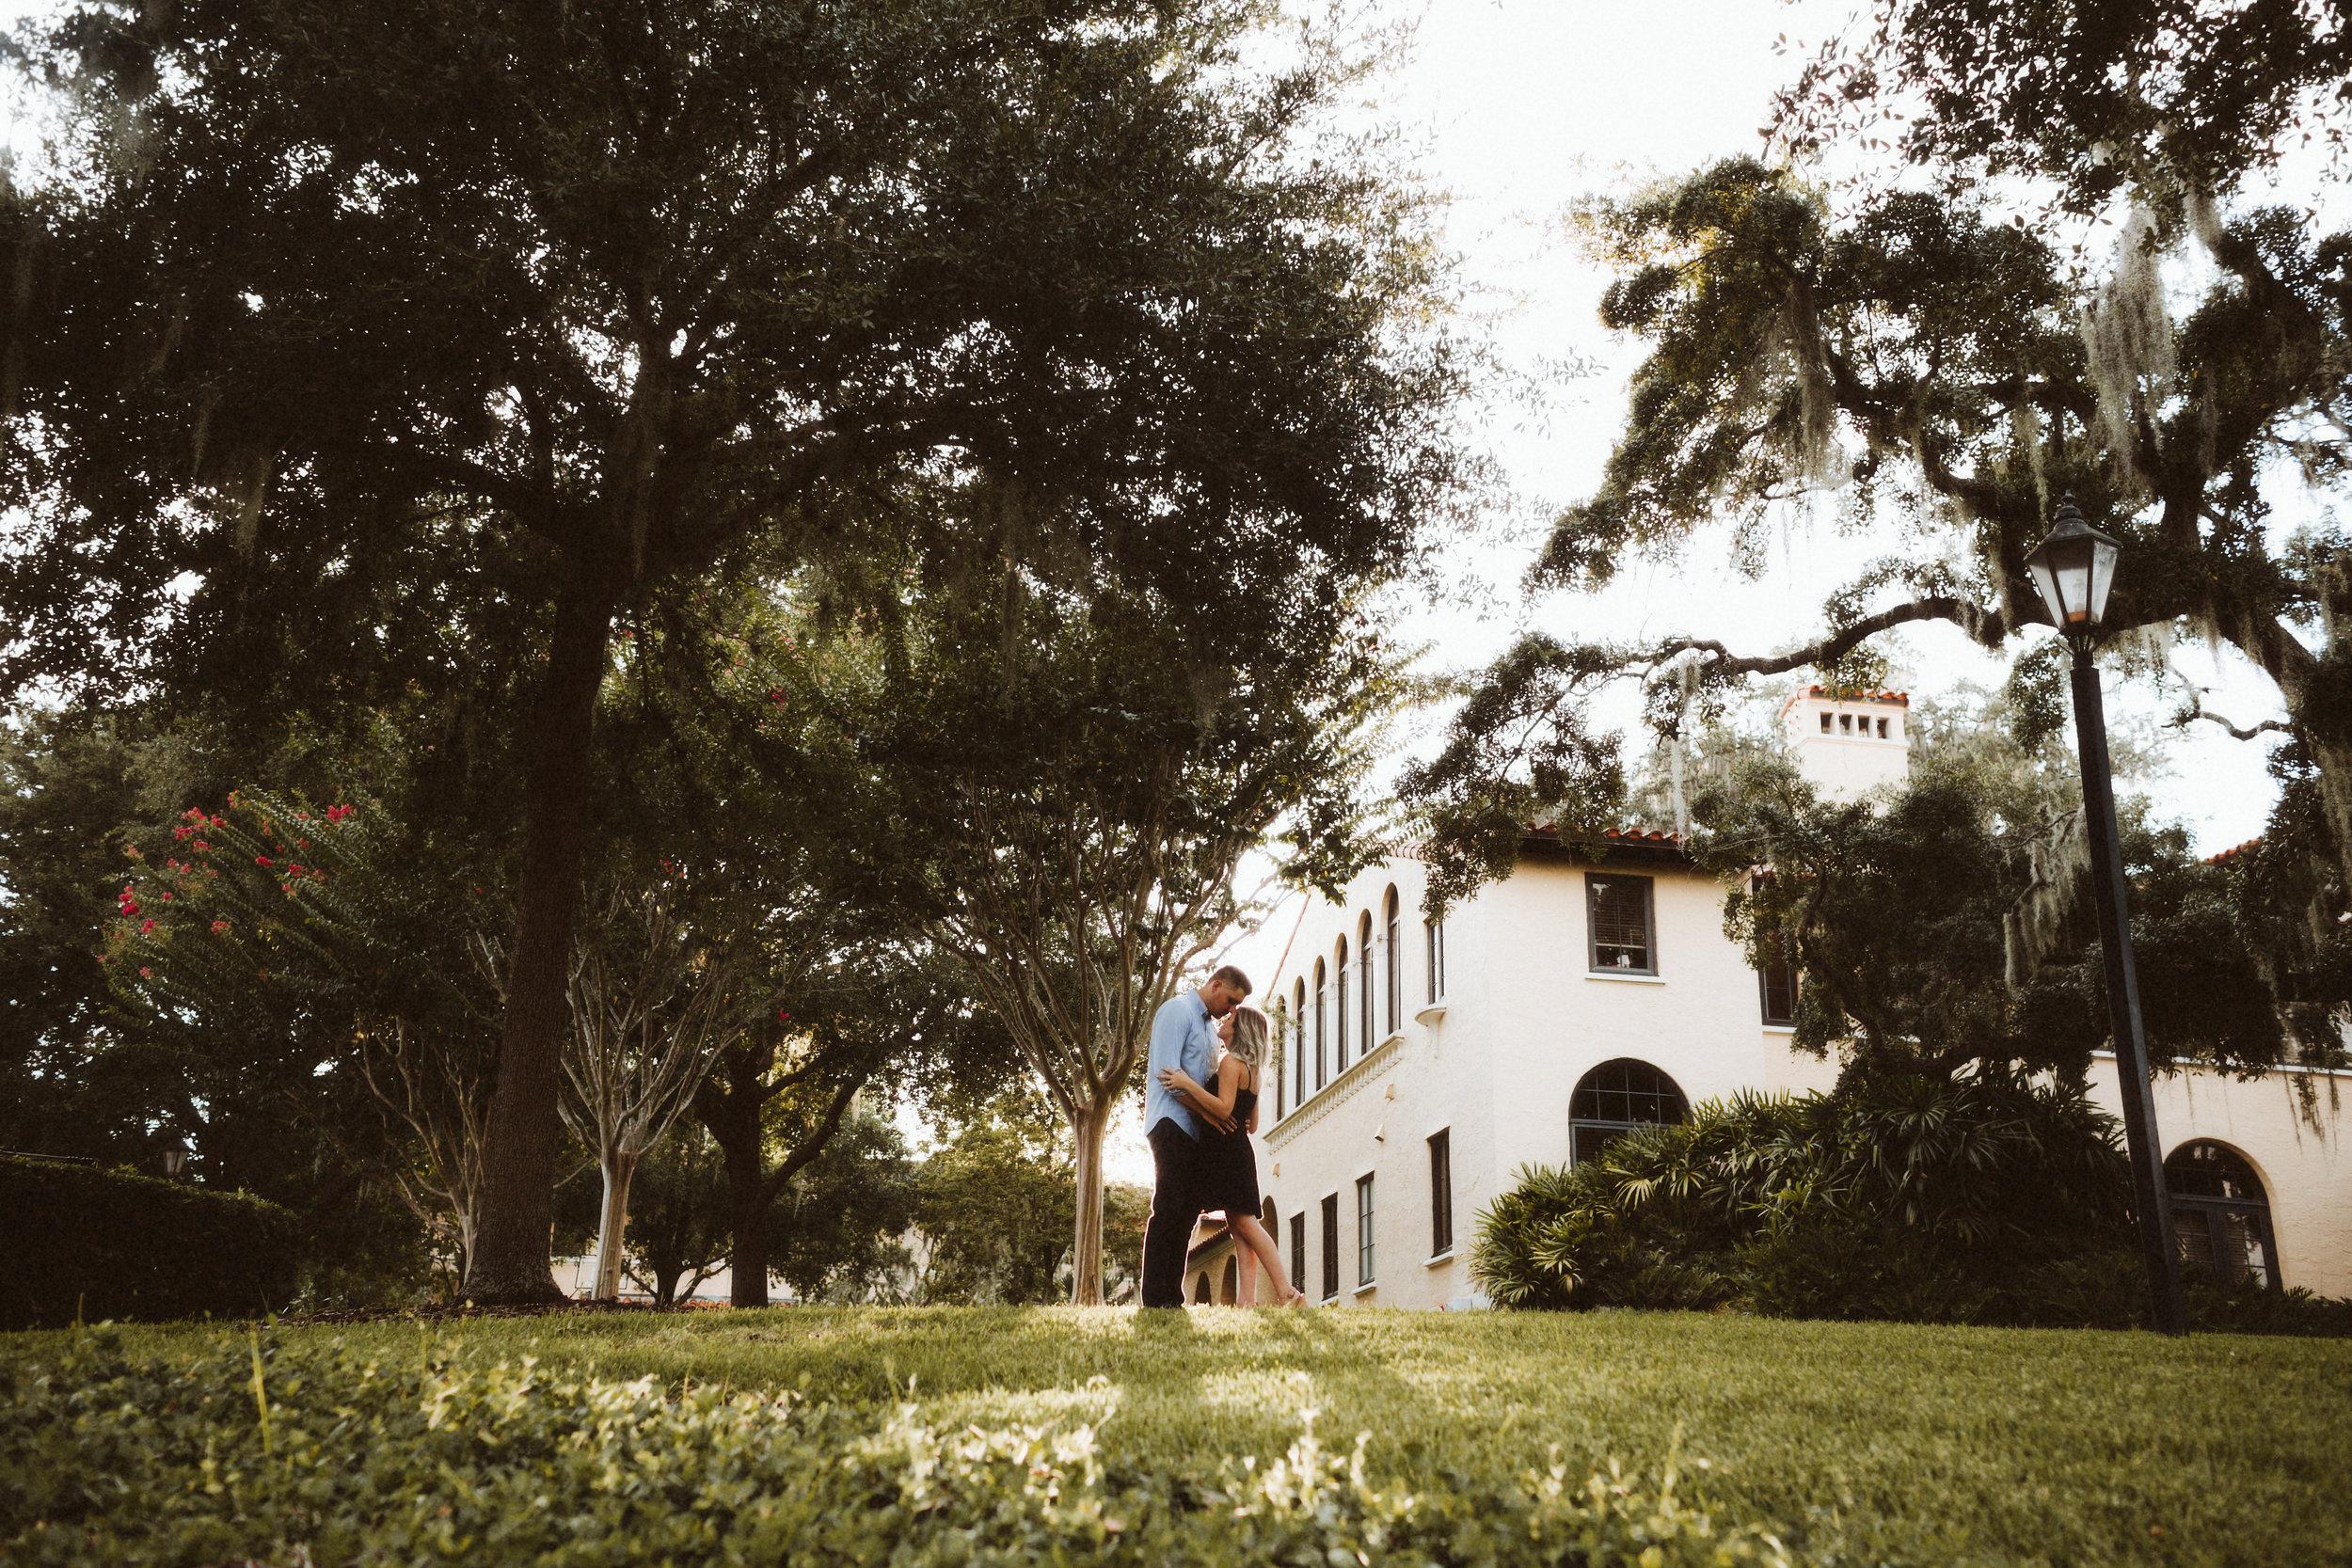 Engagement Session | Rollins College | Winter Park, FL | vanessaboy.com